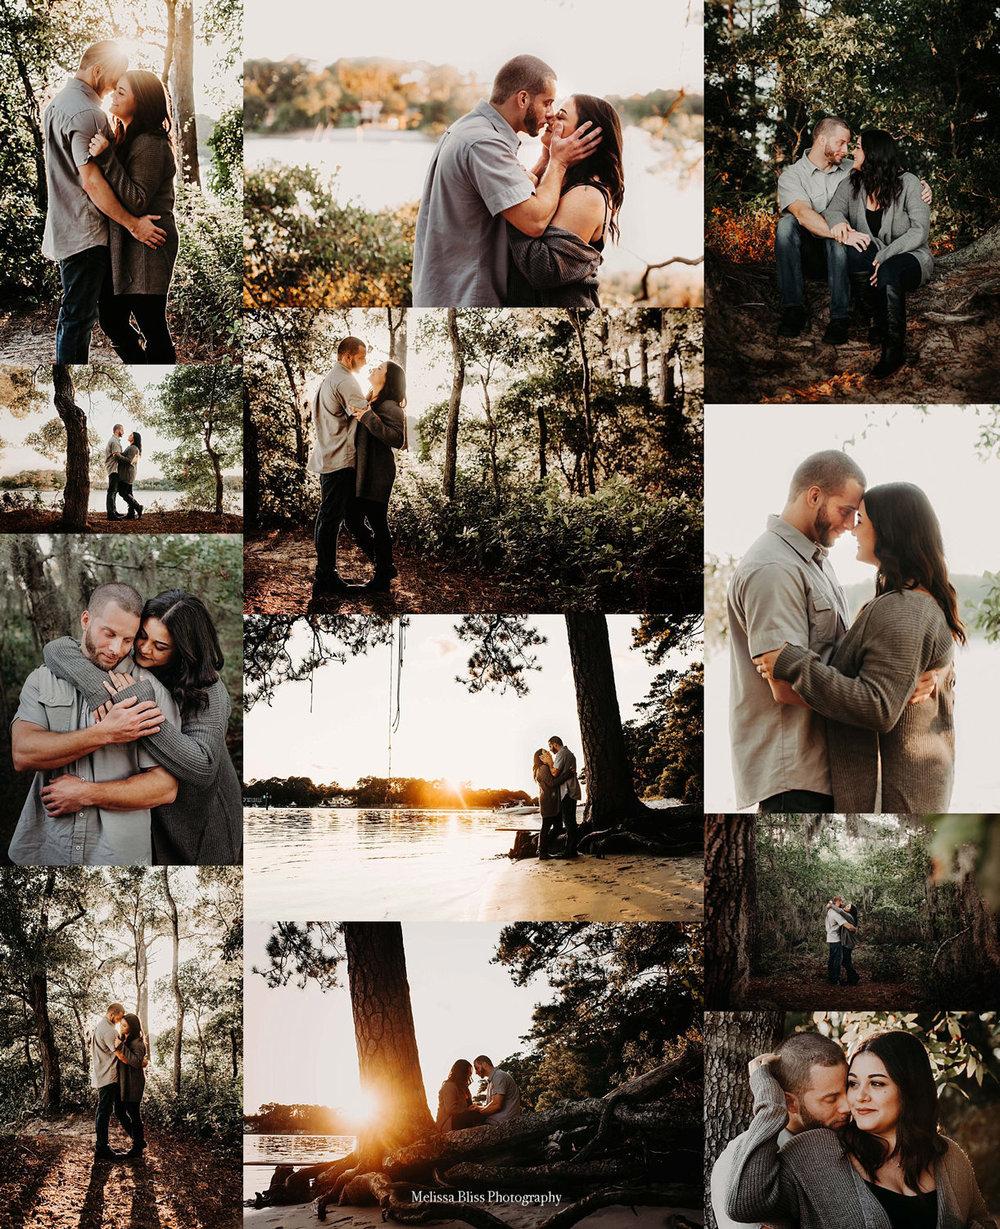 creative-engagement-photos-virginia-beach-fall-engagement-session-melissa-bliss-photography-norfolk-VA-wedding-photographer.jpg